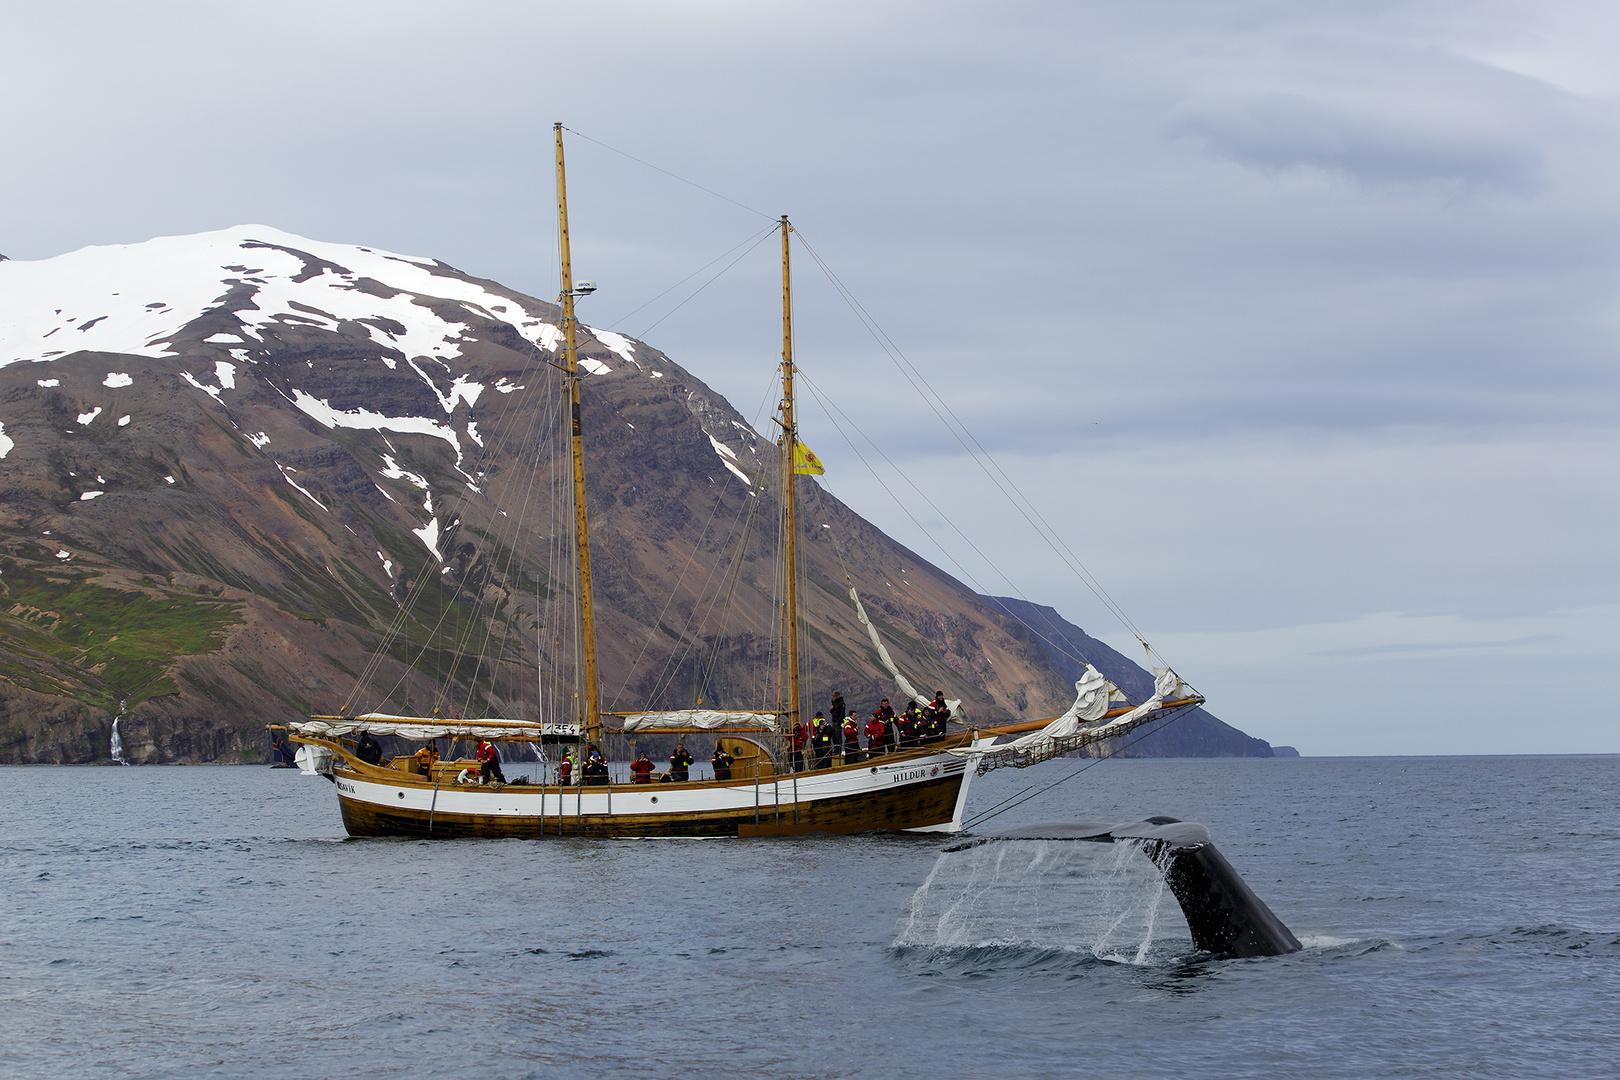 Wale bei Husavik Island